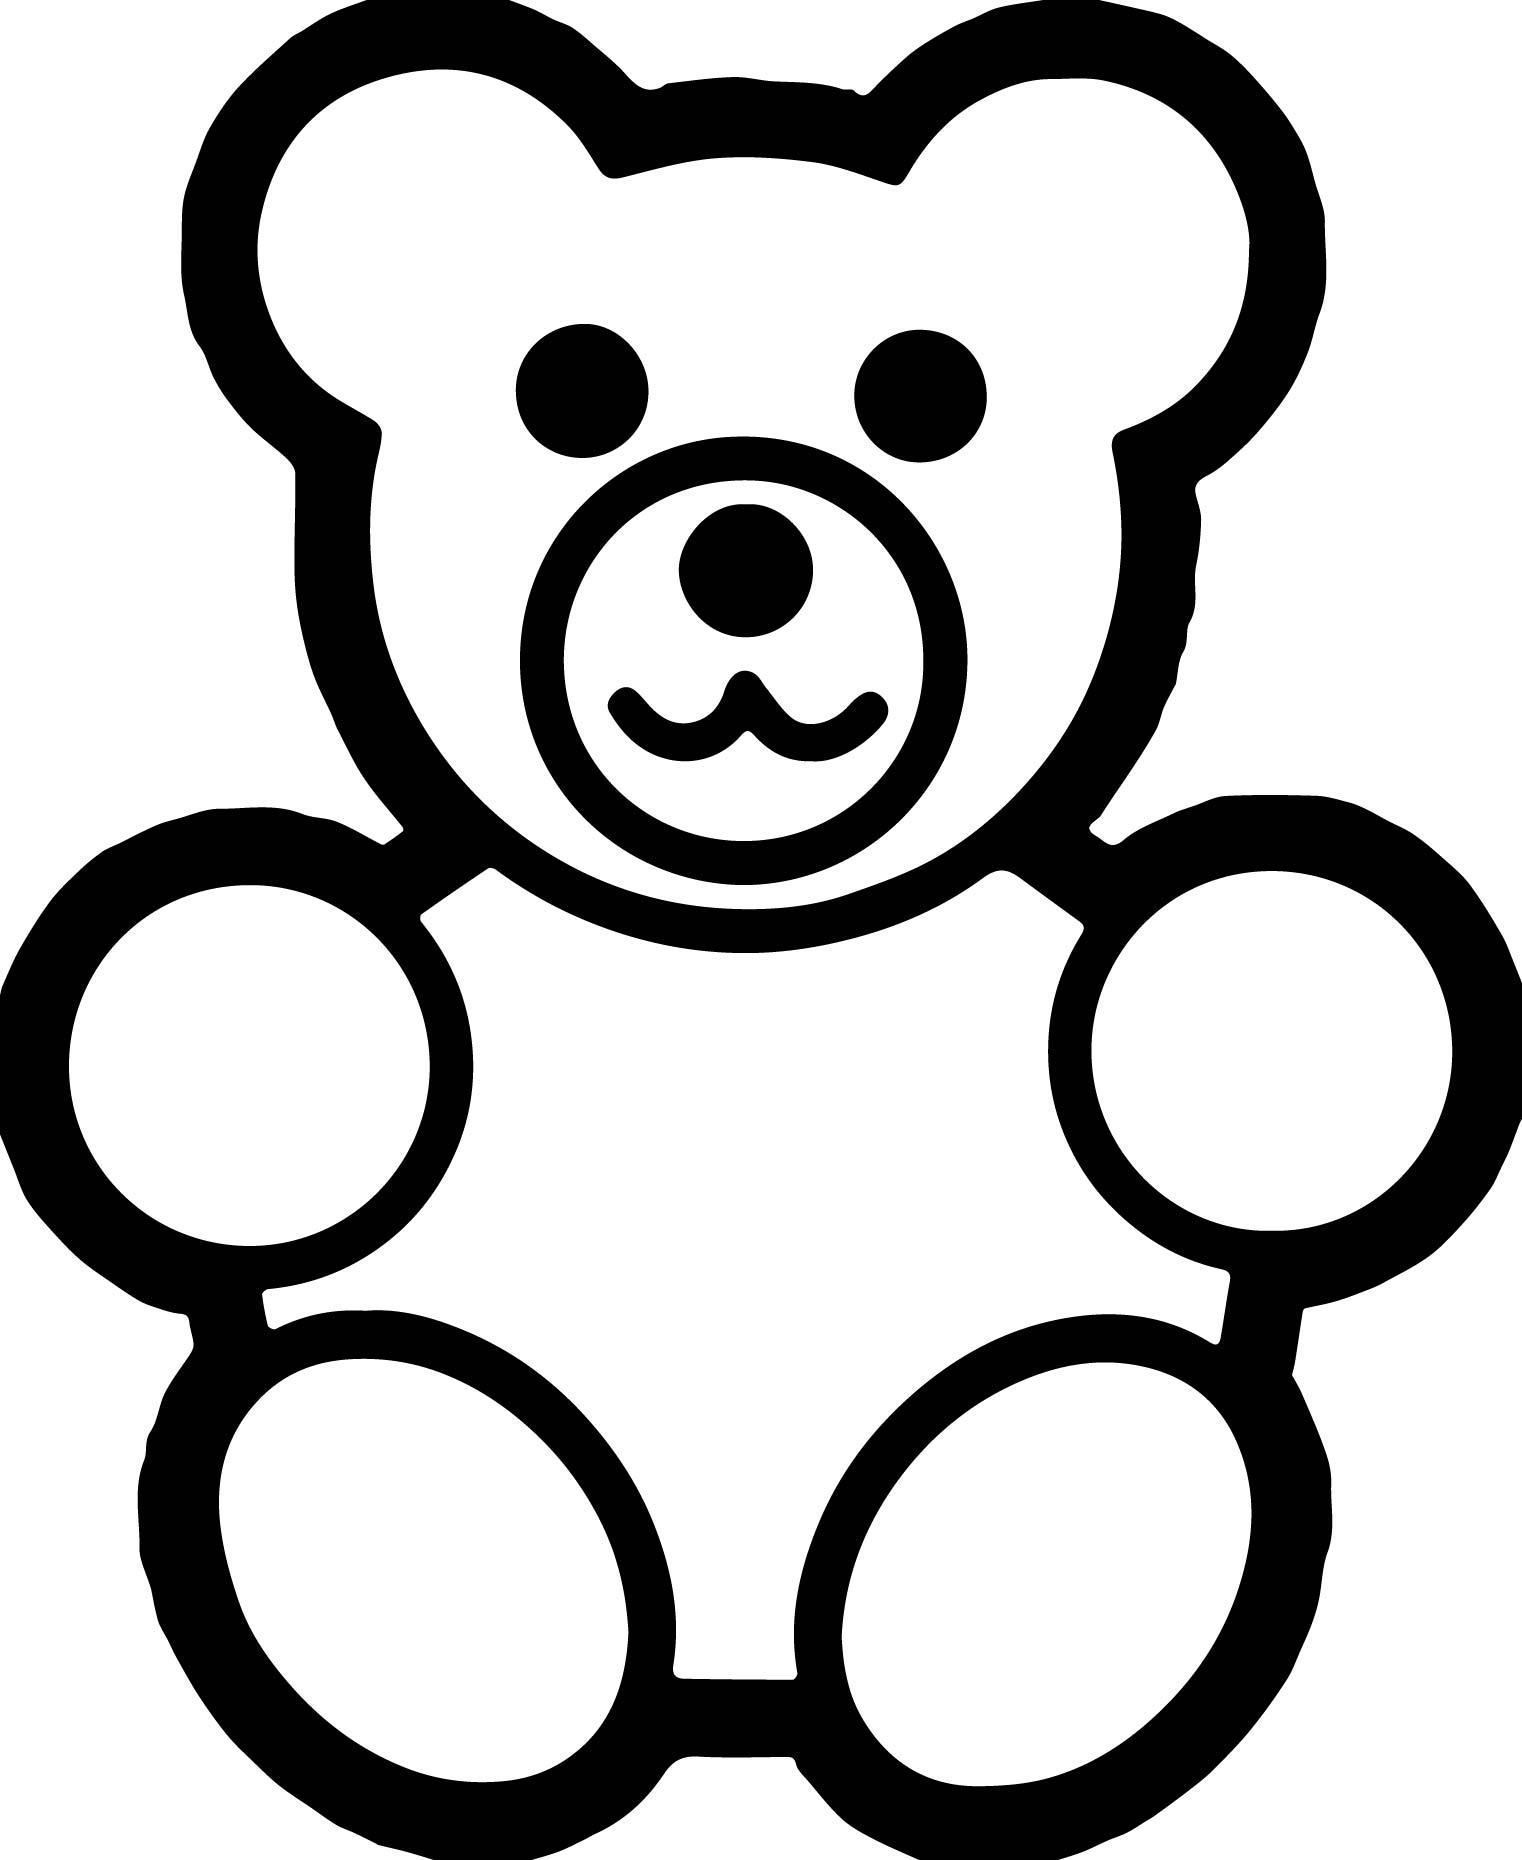 Basic Preschool Bear Coloring Page